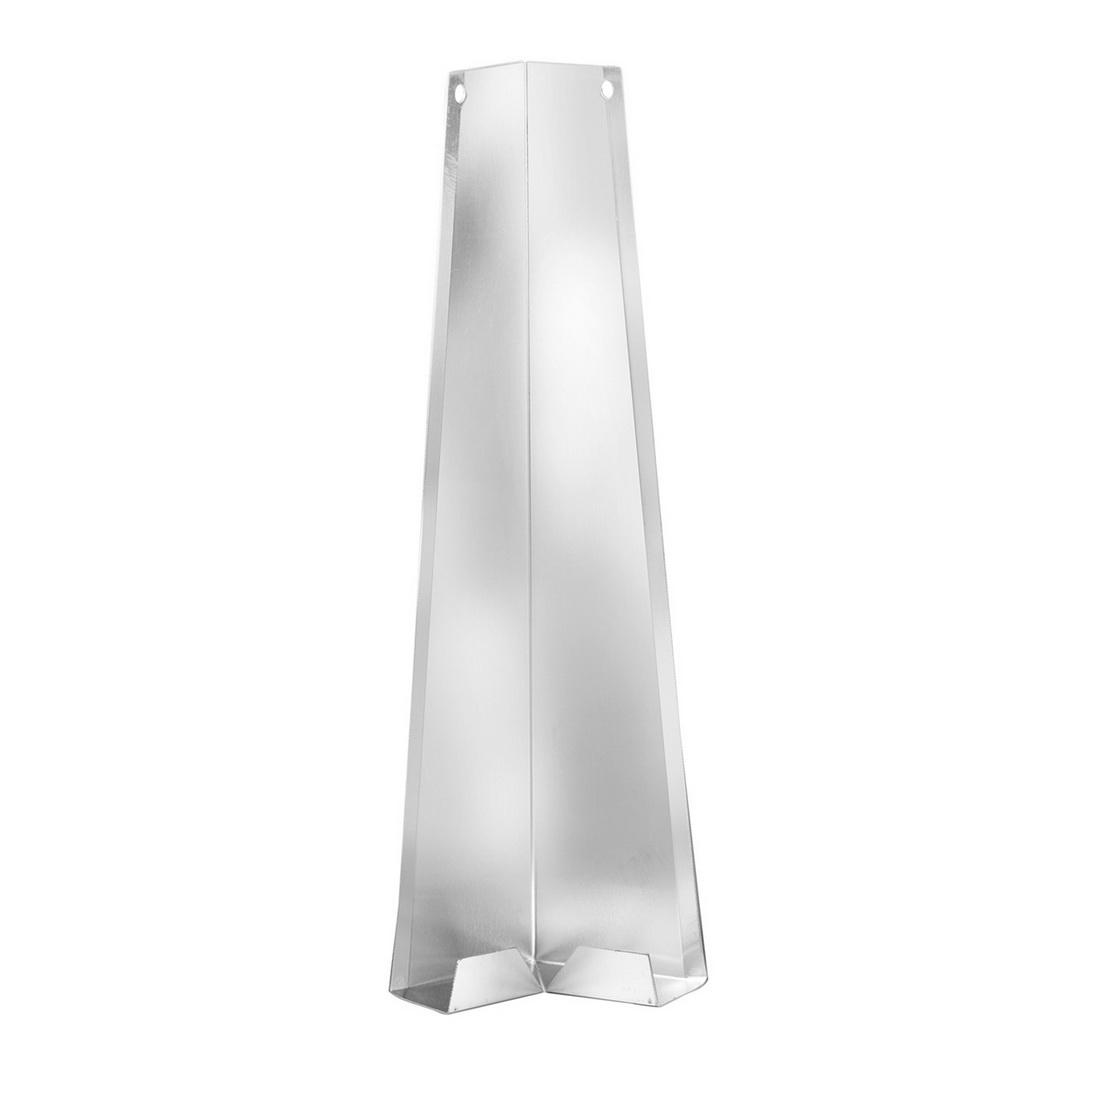 Linea Weatherboard 135mm Aluminium External Corner Soaker 90 Degree